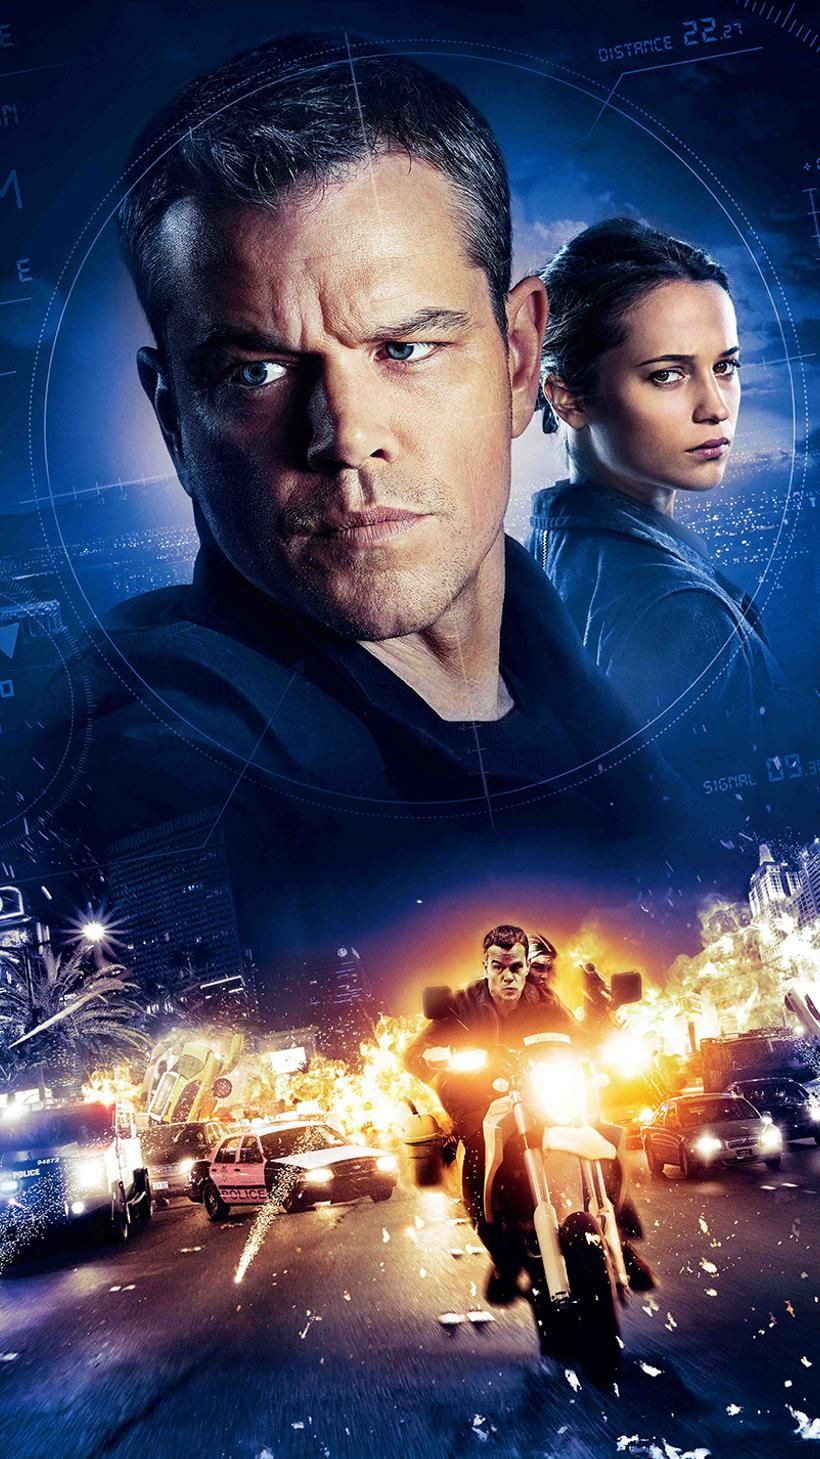 Prison Break Phone Wallpaper Moviemania Jason Bourne Jason Bourne 2016 Bourne Movies